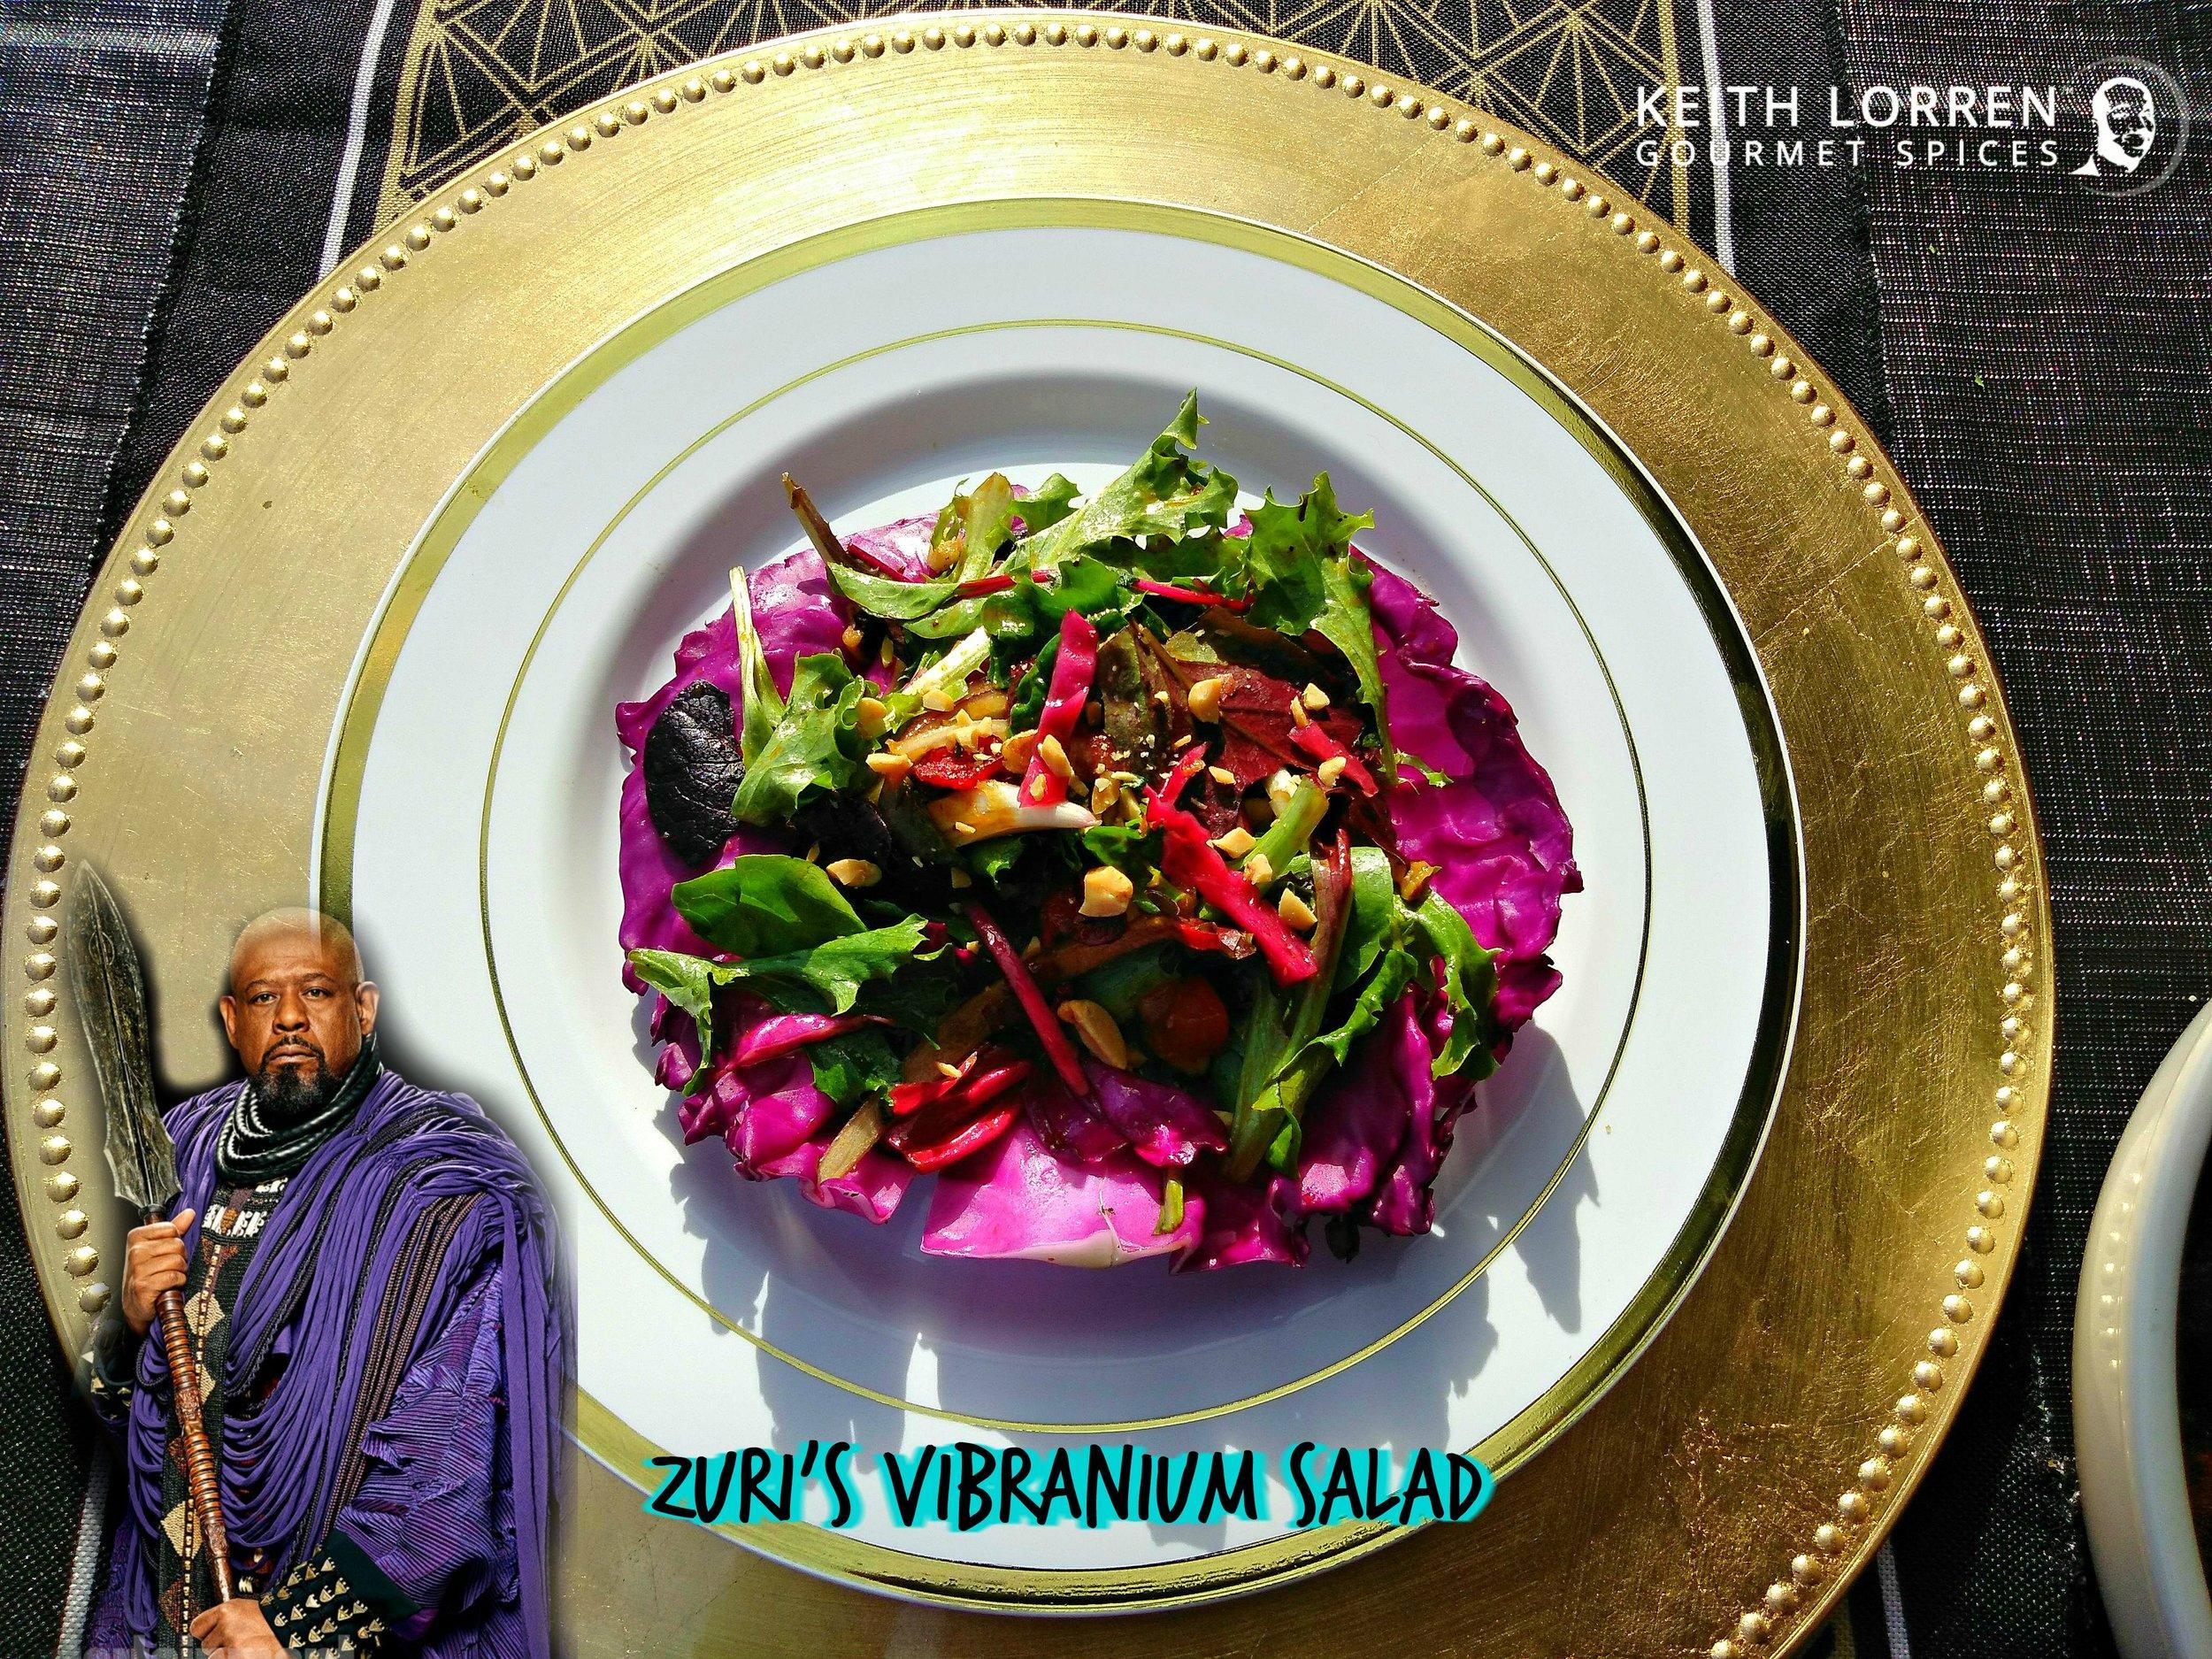 zuri vibranium salad.jpg